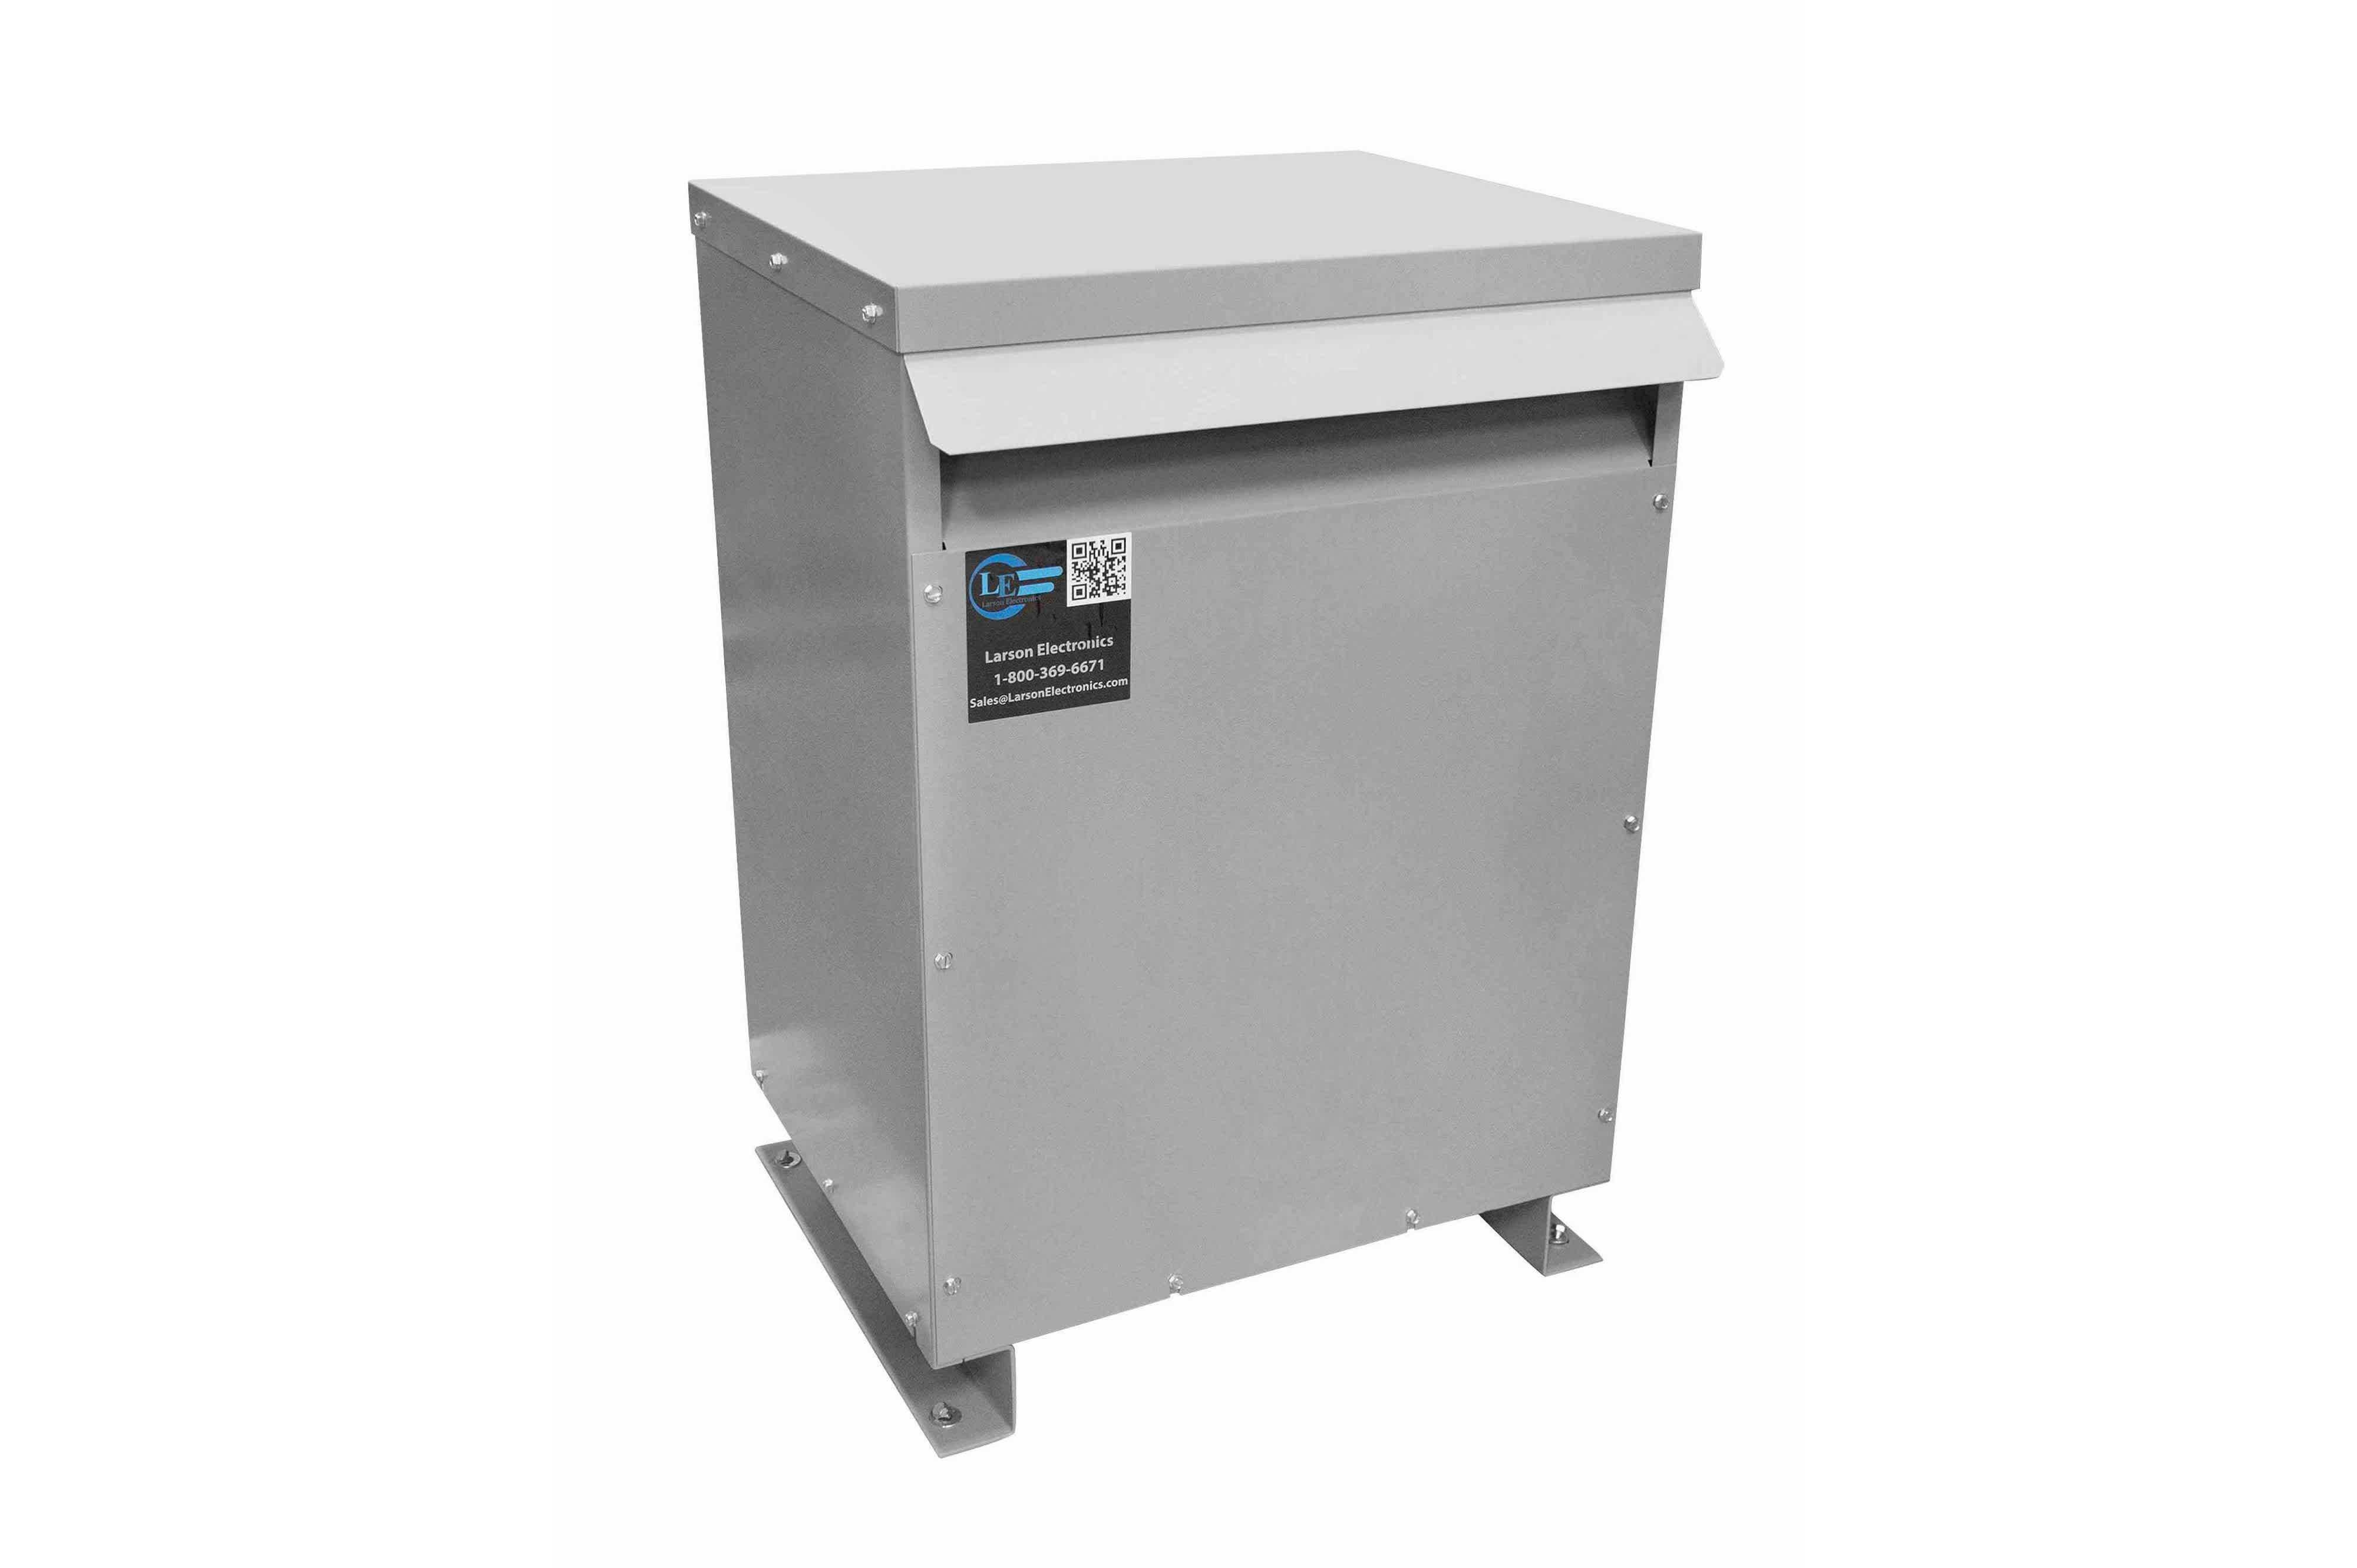 60 kVA 3PH DOE Transformer, 208V Delta Primary, 415Y/240 Wye-N Secondary, N3R, Ventilated, 60 Hz